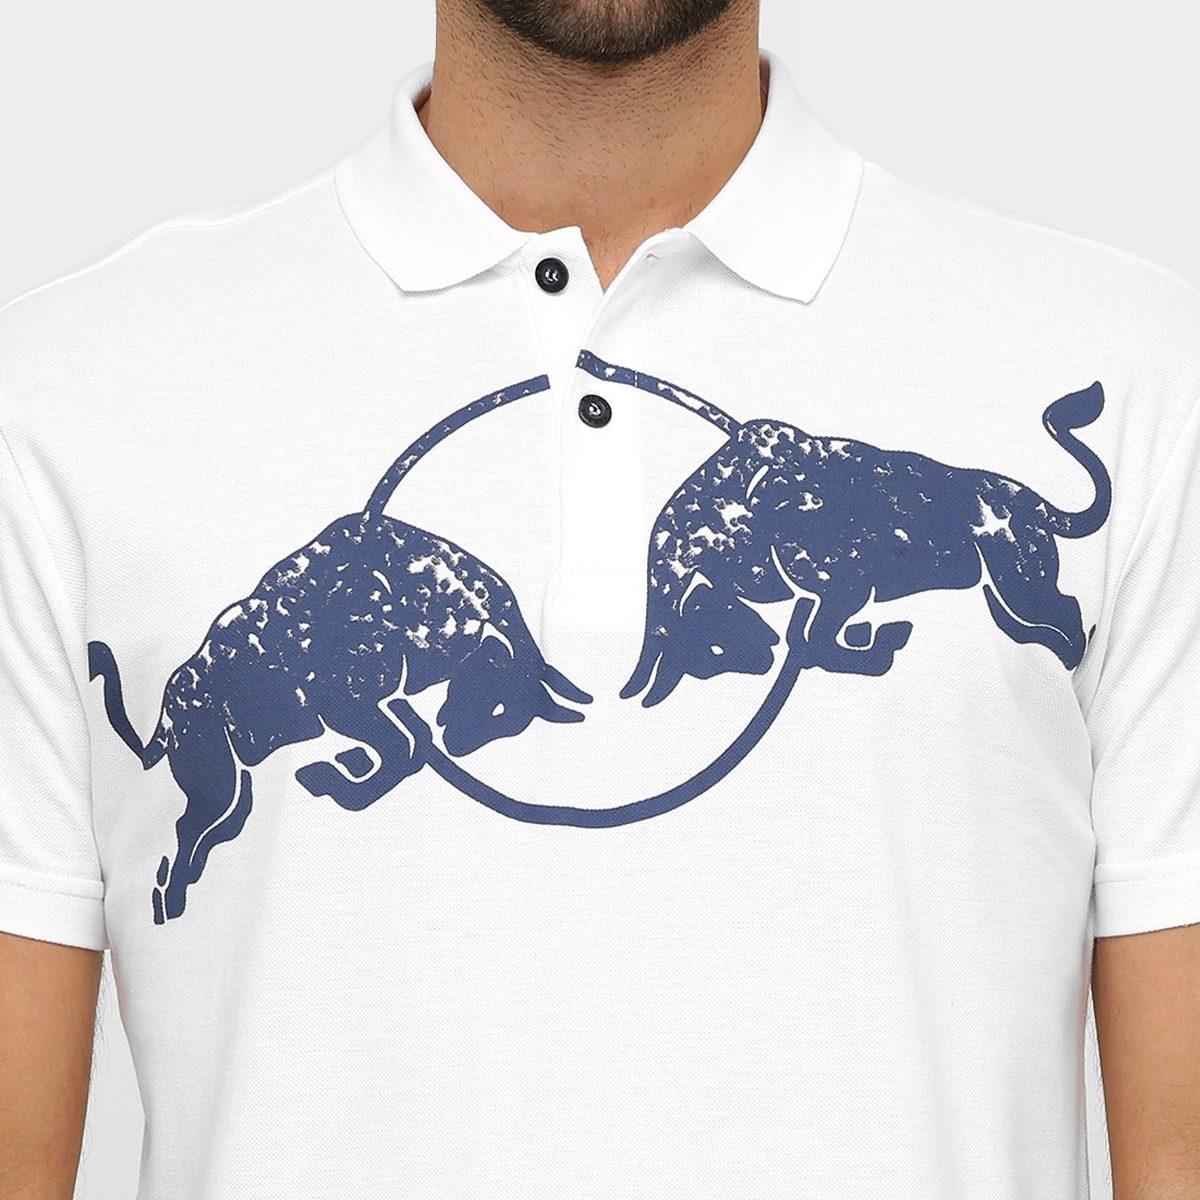 camisa masculina red bull racing stock polo branco asphalt. Carregando zoom. 5a928d9657a